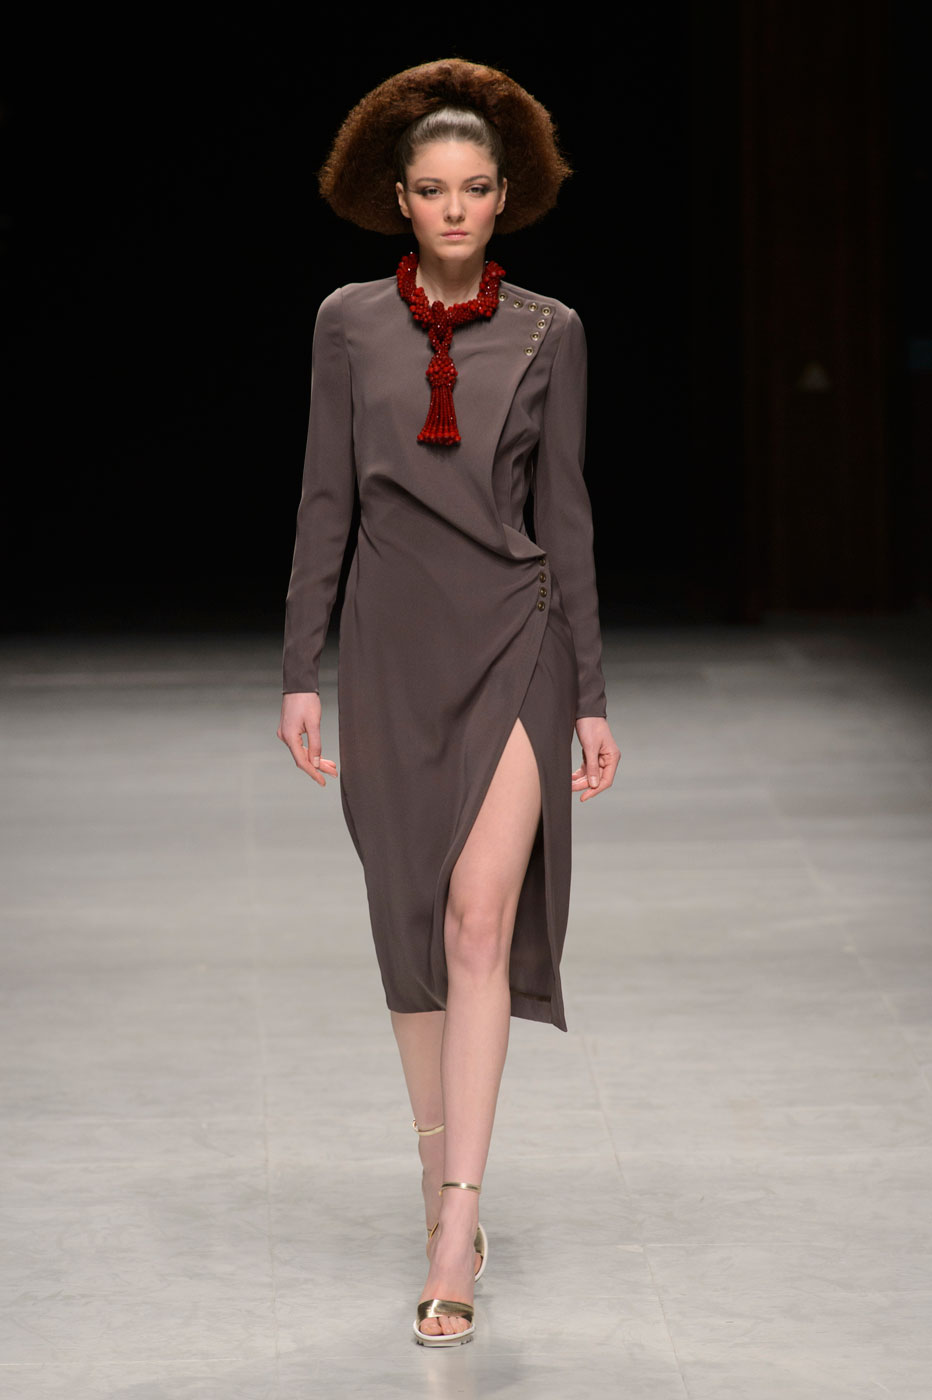 Julien-Fournie-Prive-fashion-runway-show-haute-couture-paris-spring-2015-the-impression-18